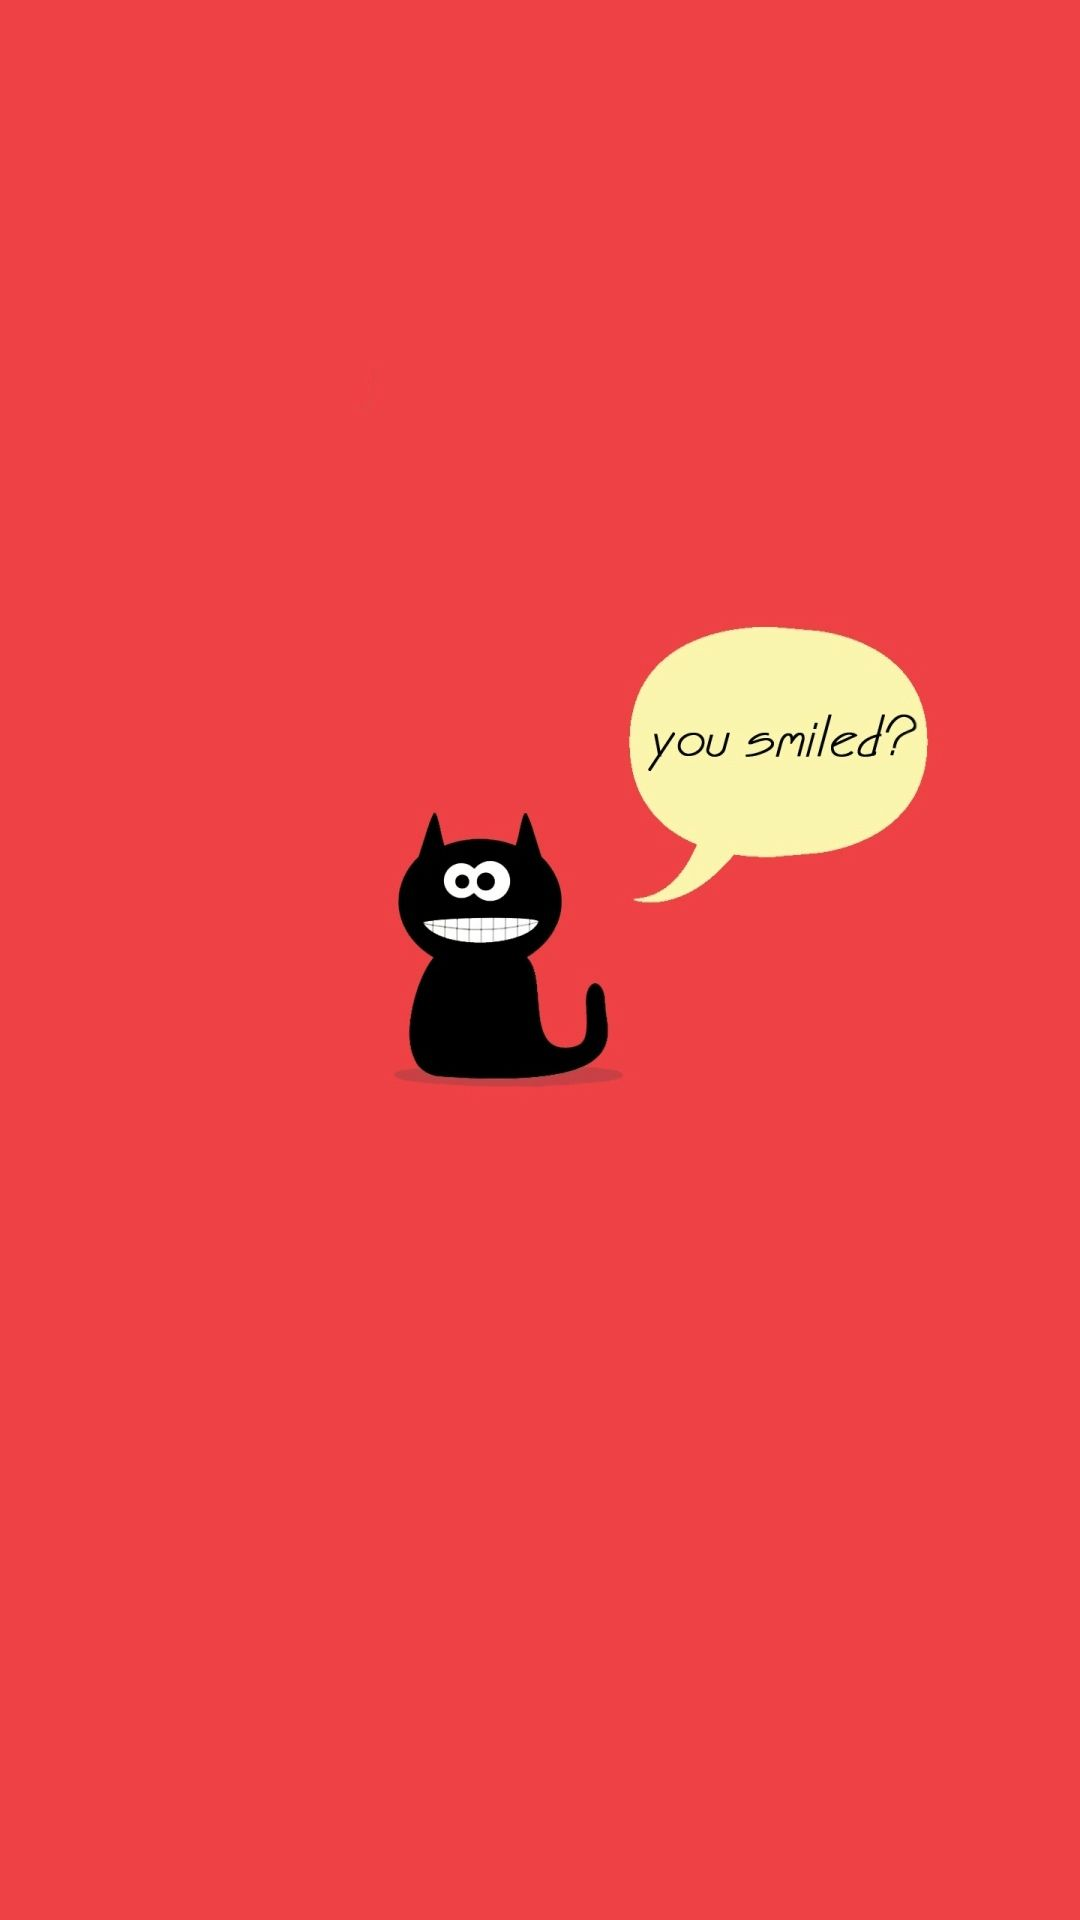 Cute Cat Smile Iphone 7 Wallpaper Iphone 6 8 Wallpapers